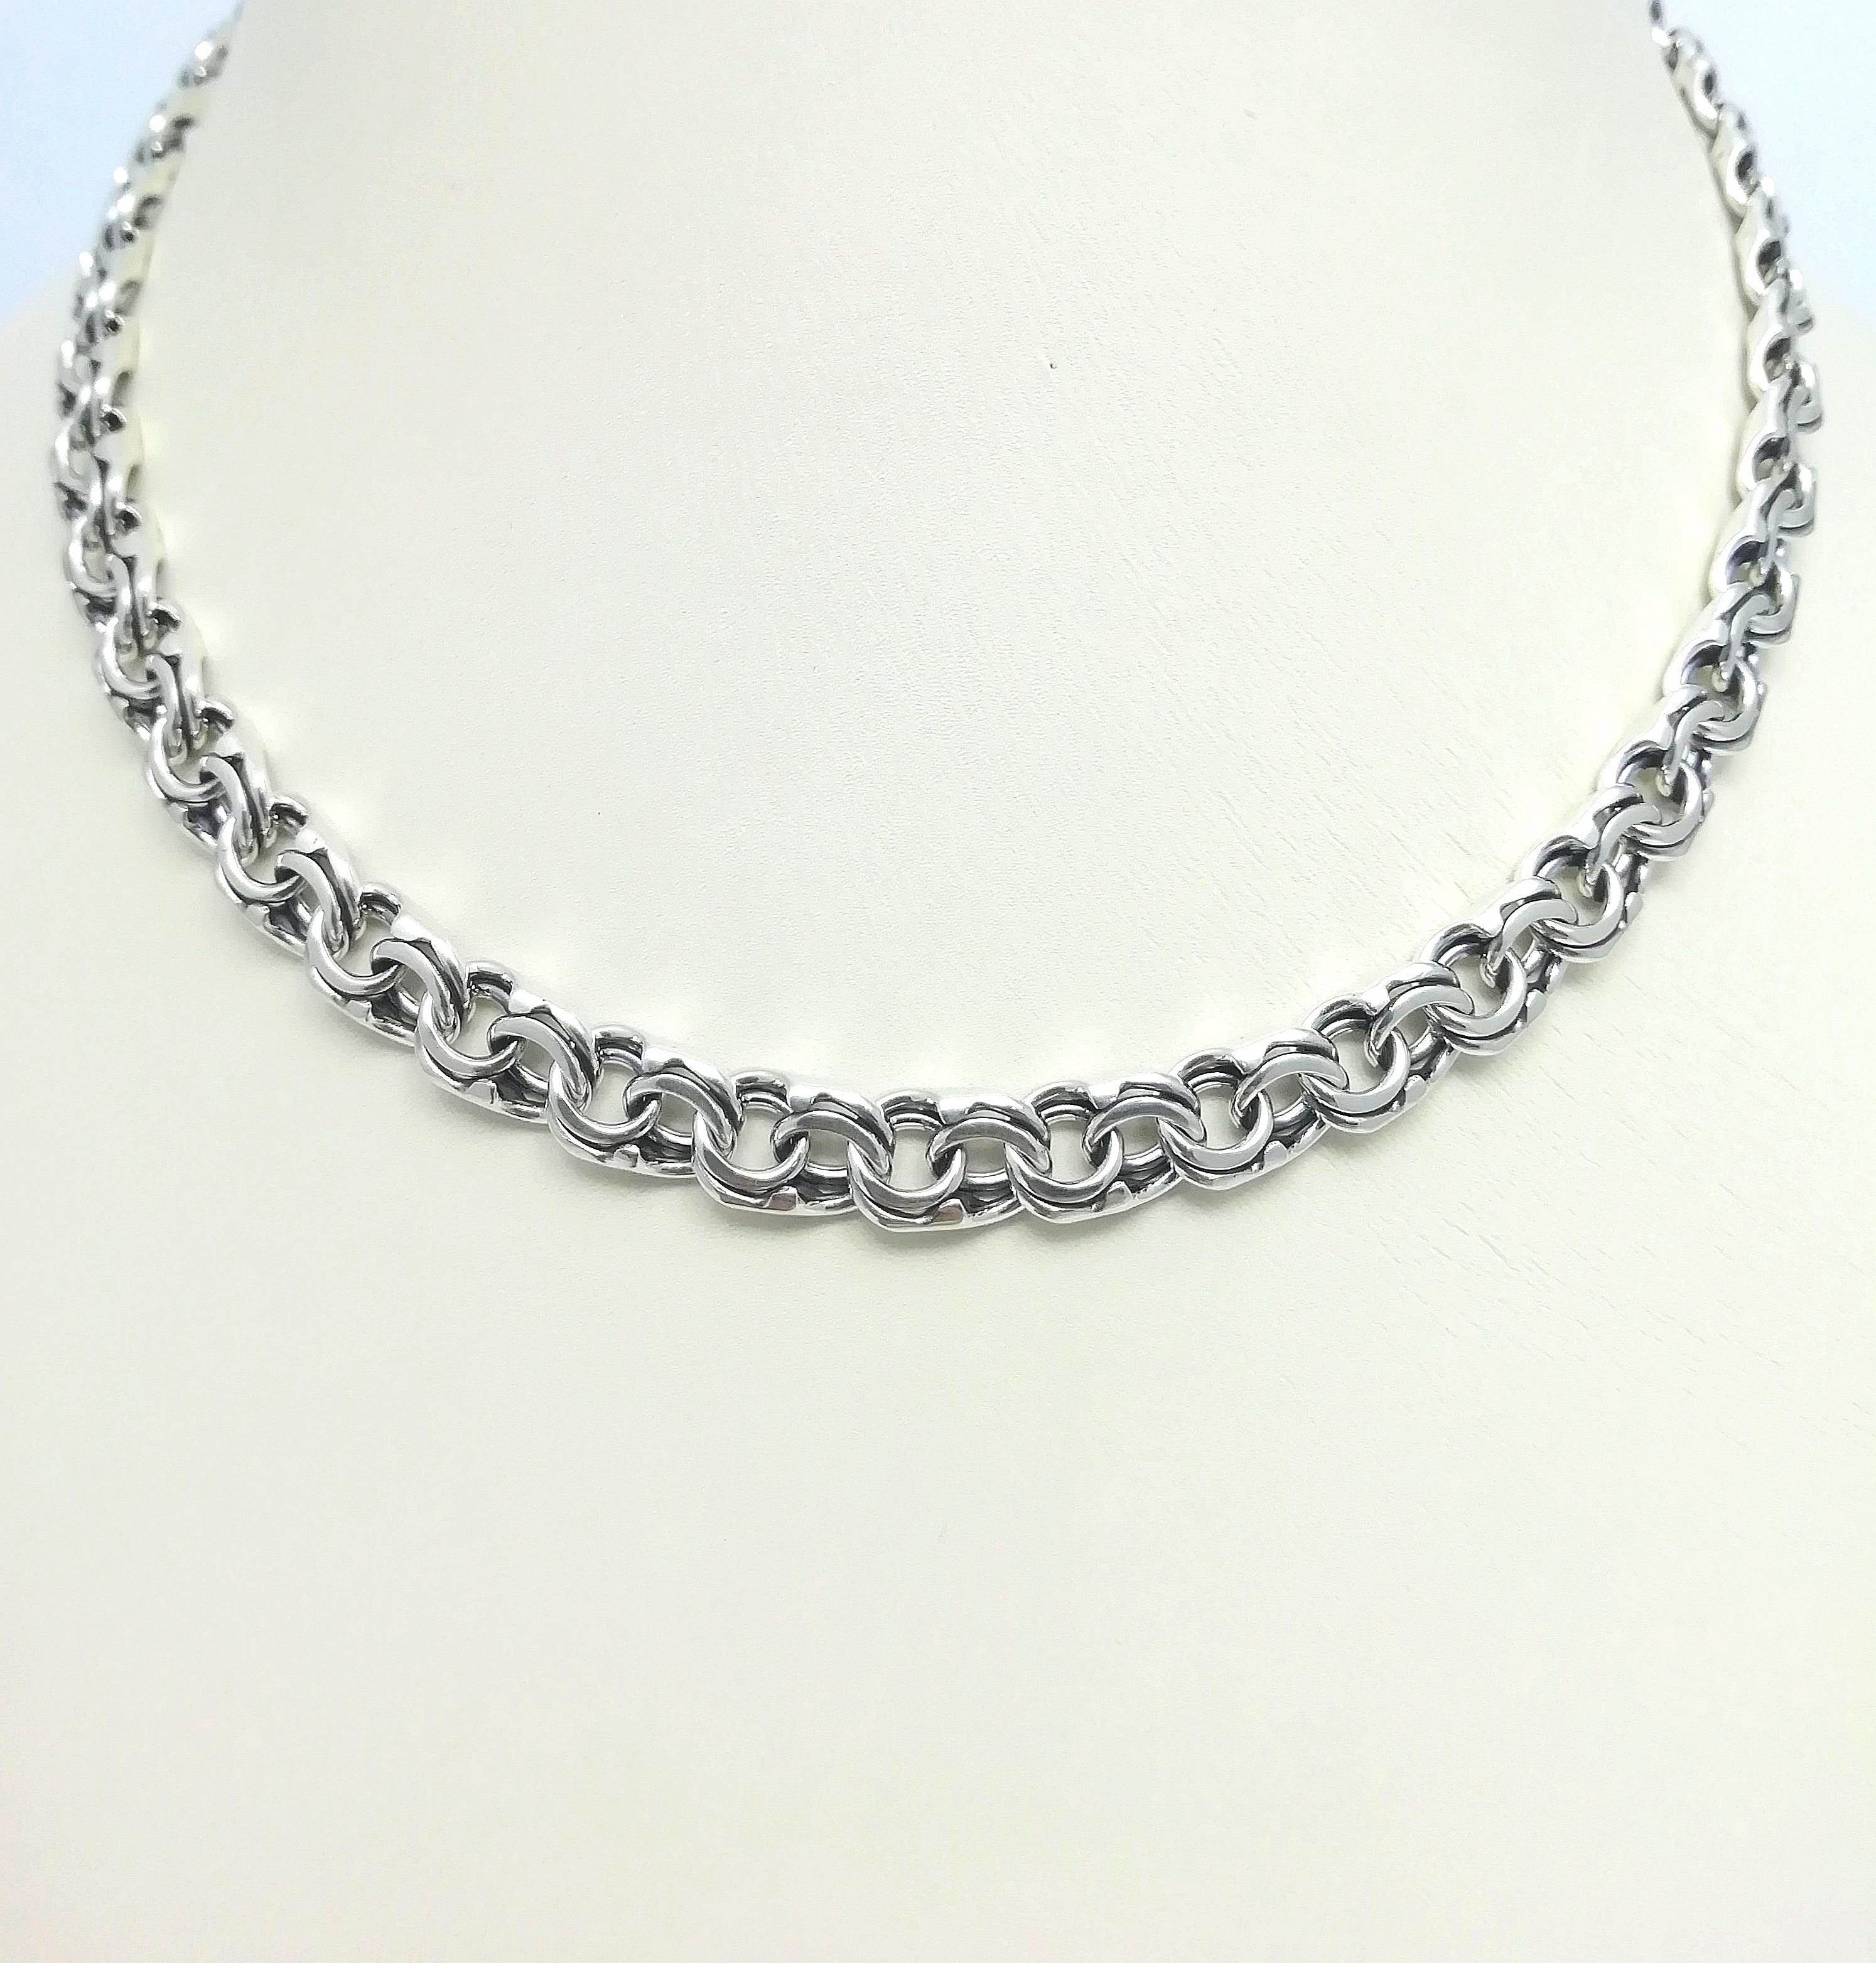 Серебро цепь дк240920-157 47,90гр